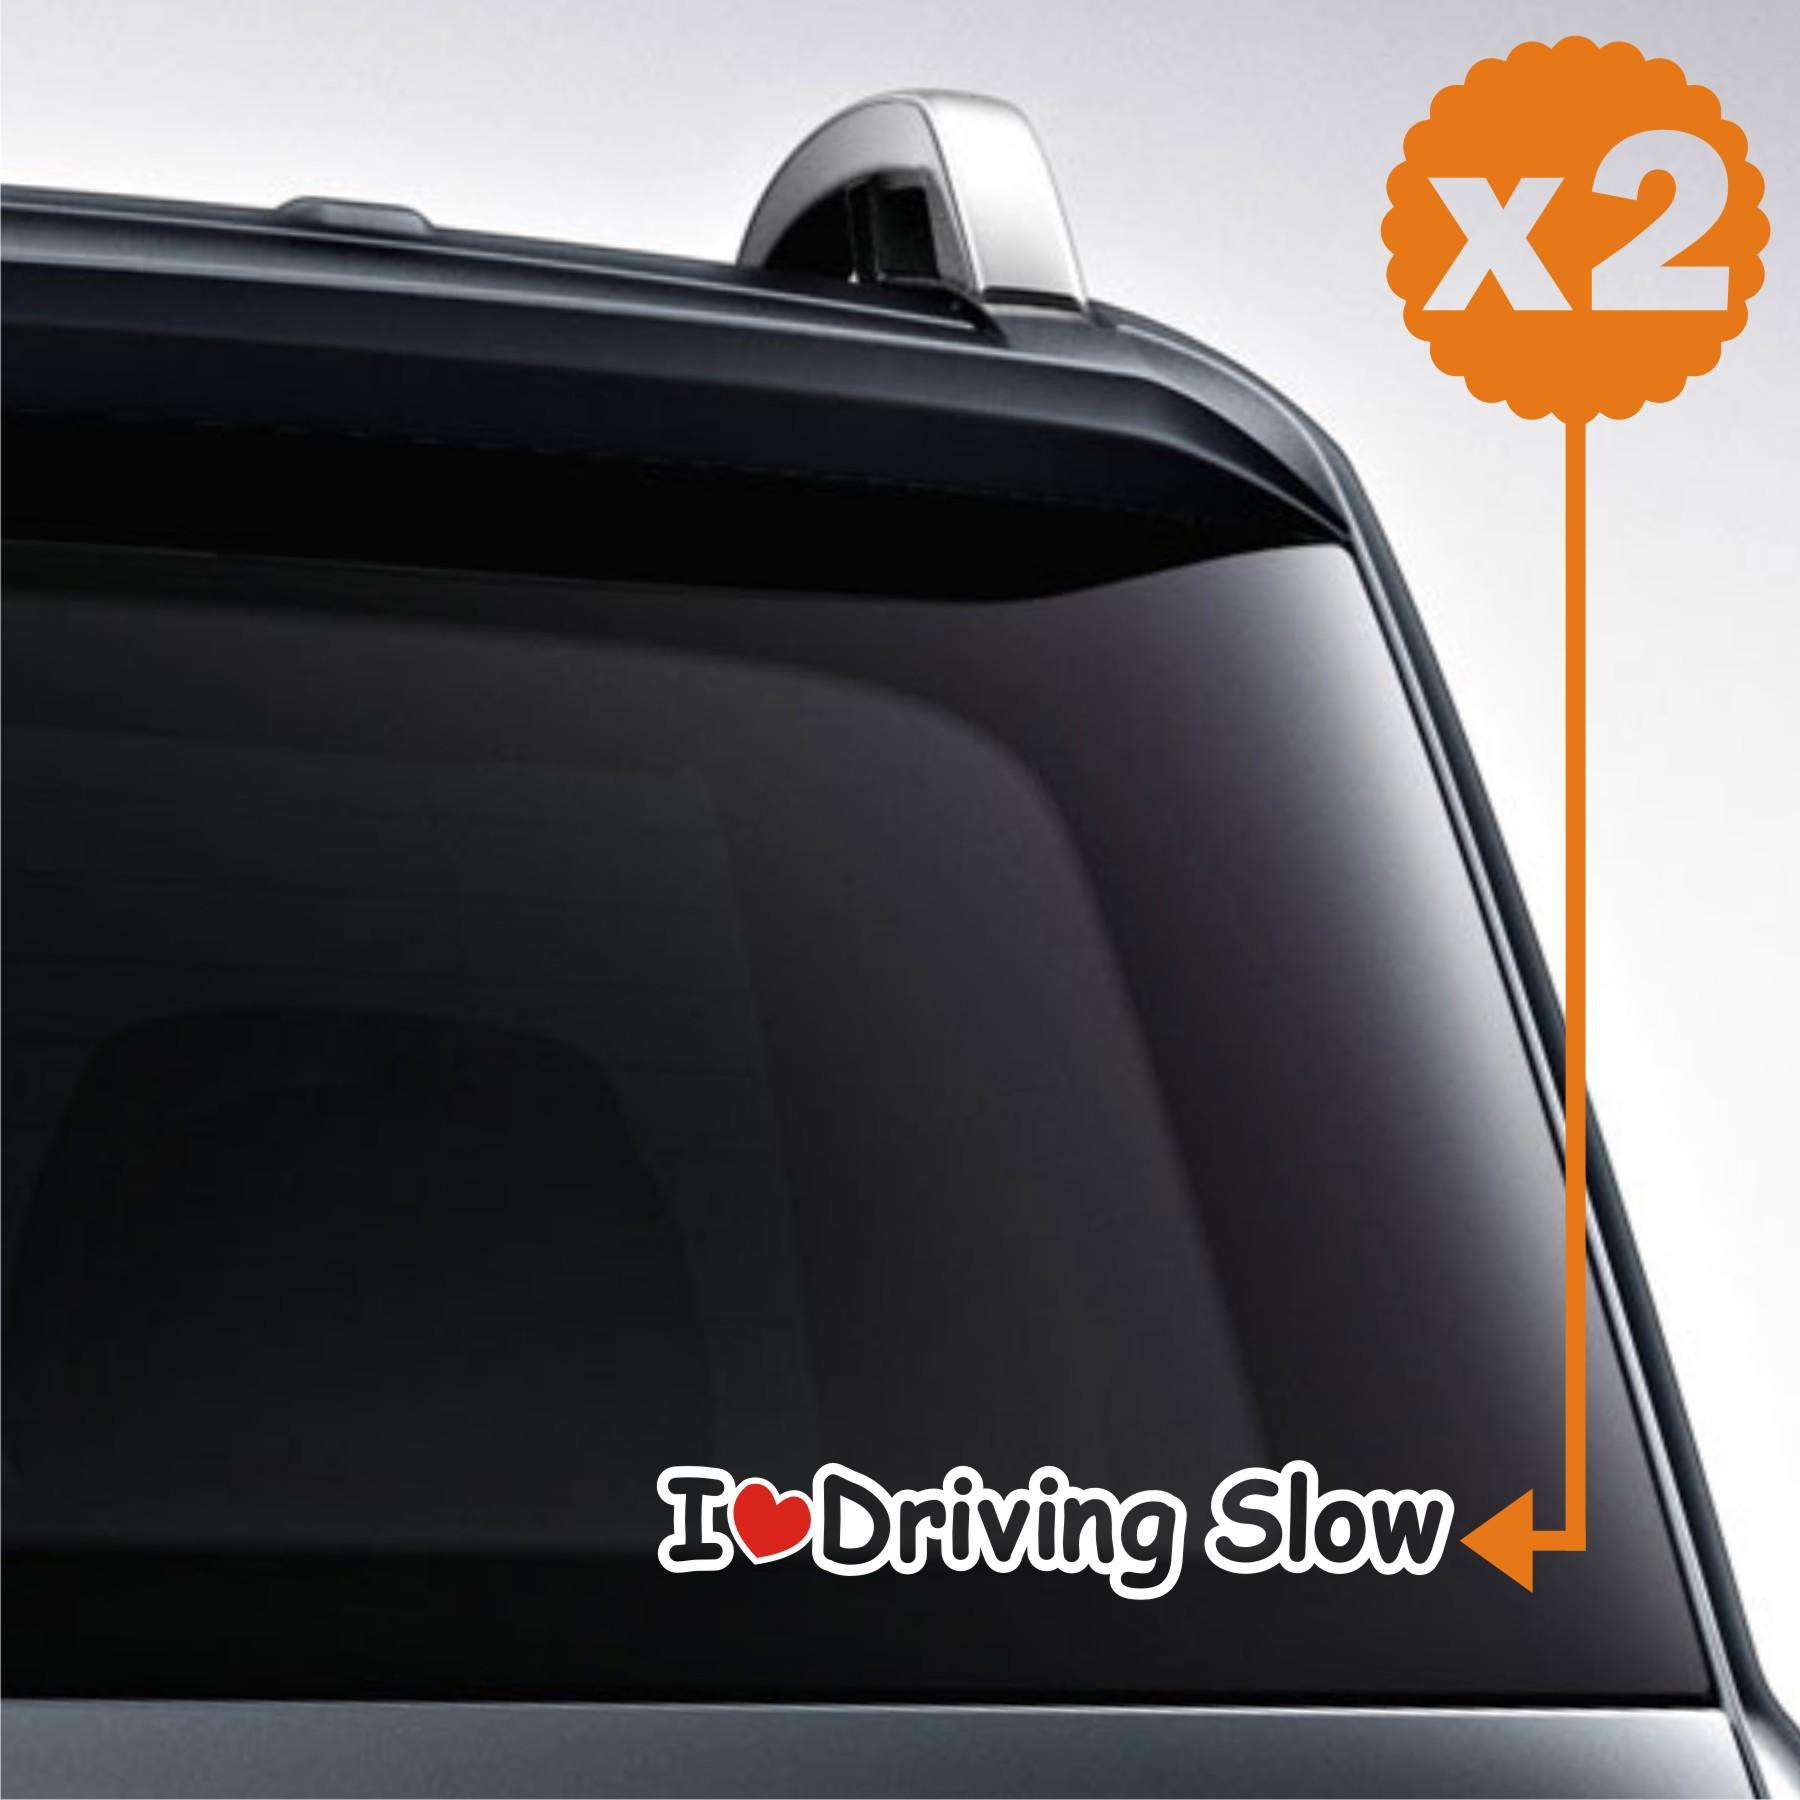 sticker mobil jdm driving slow corolla fiesta jazz terios 2x8